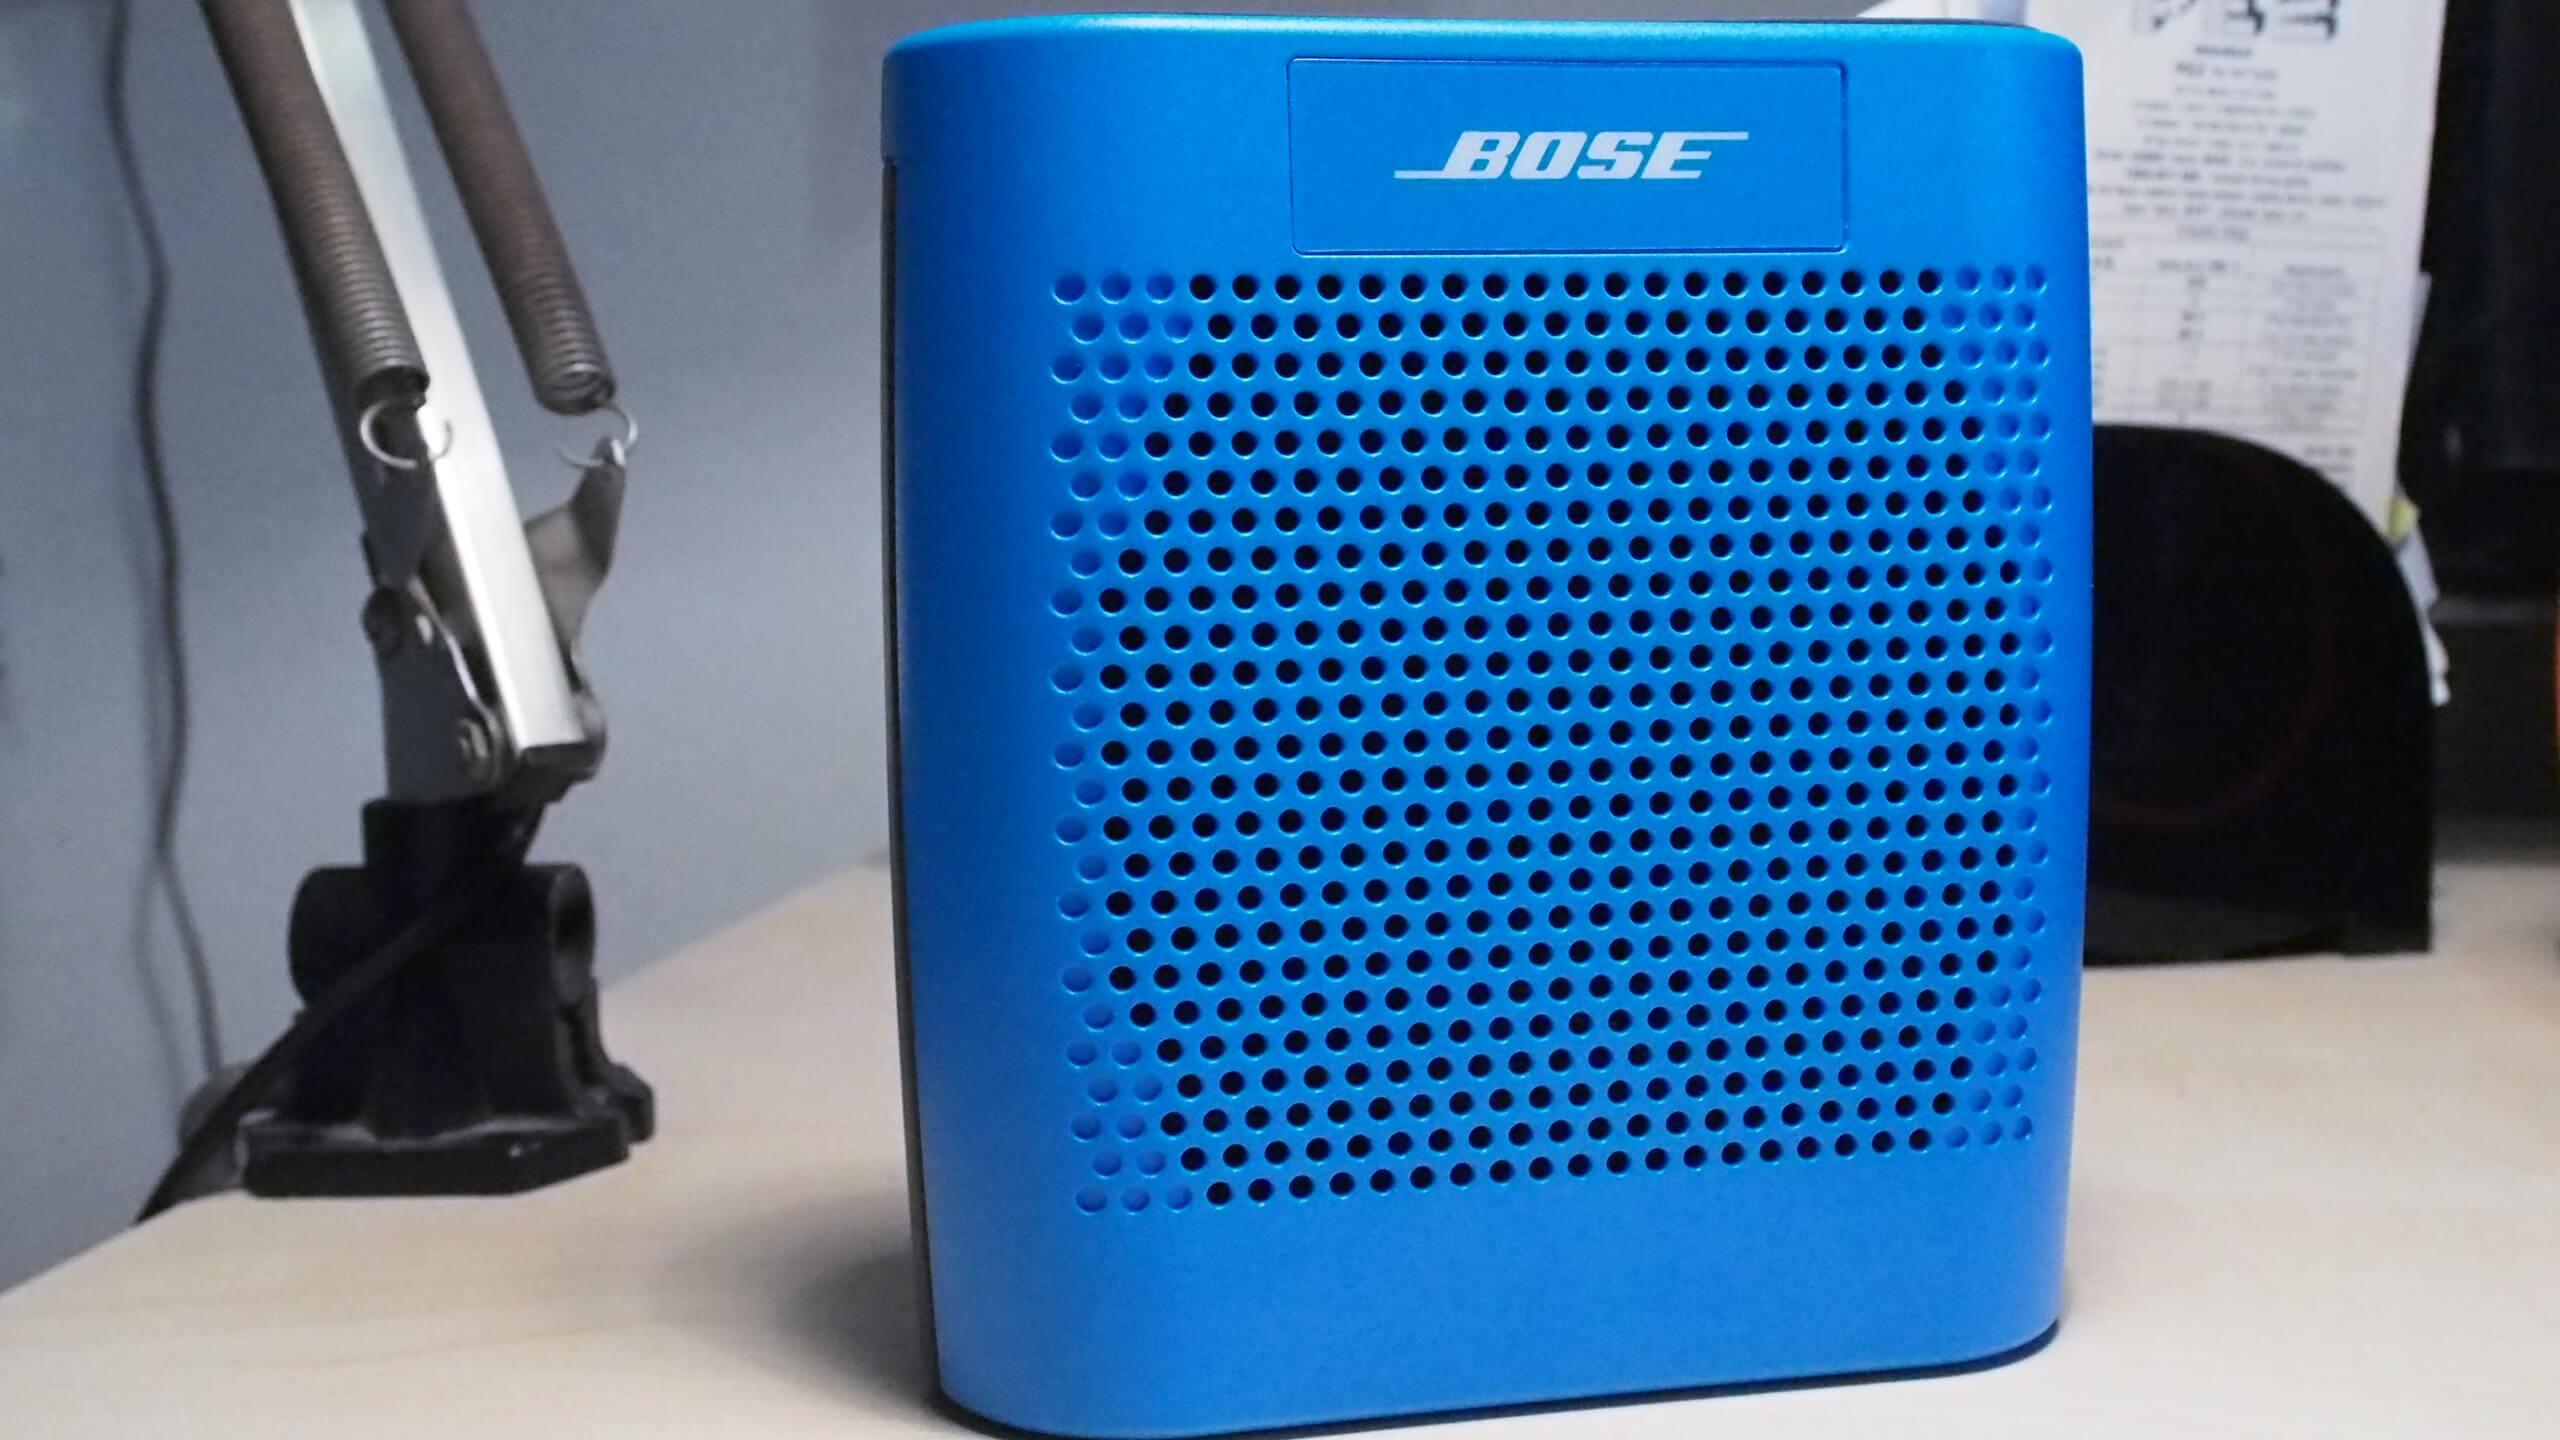 Bose SoundLink Colour בוז סאונדלינק